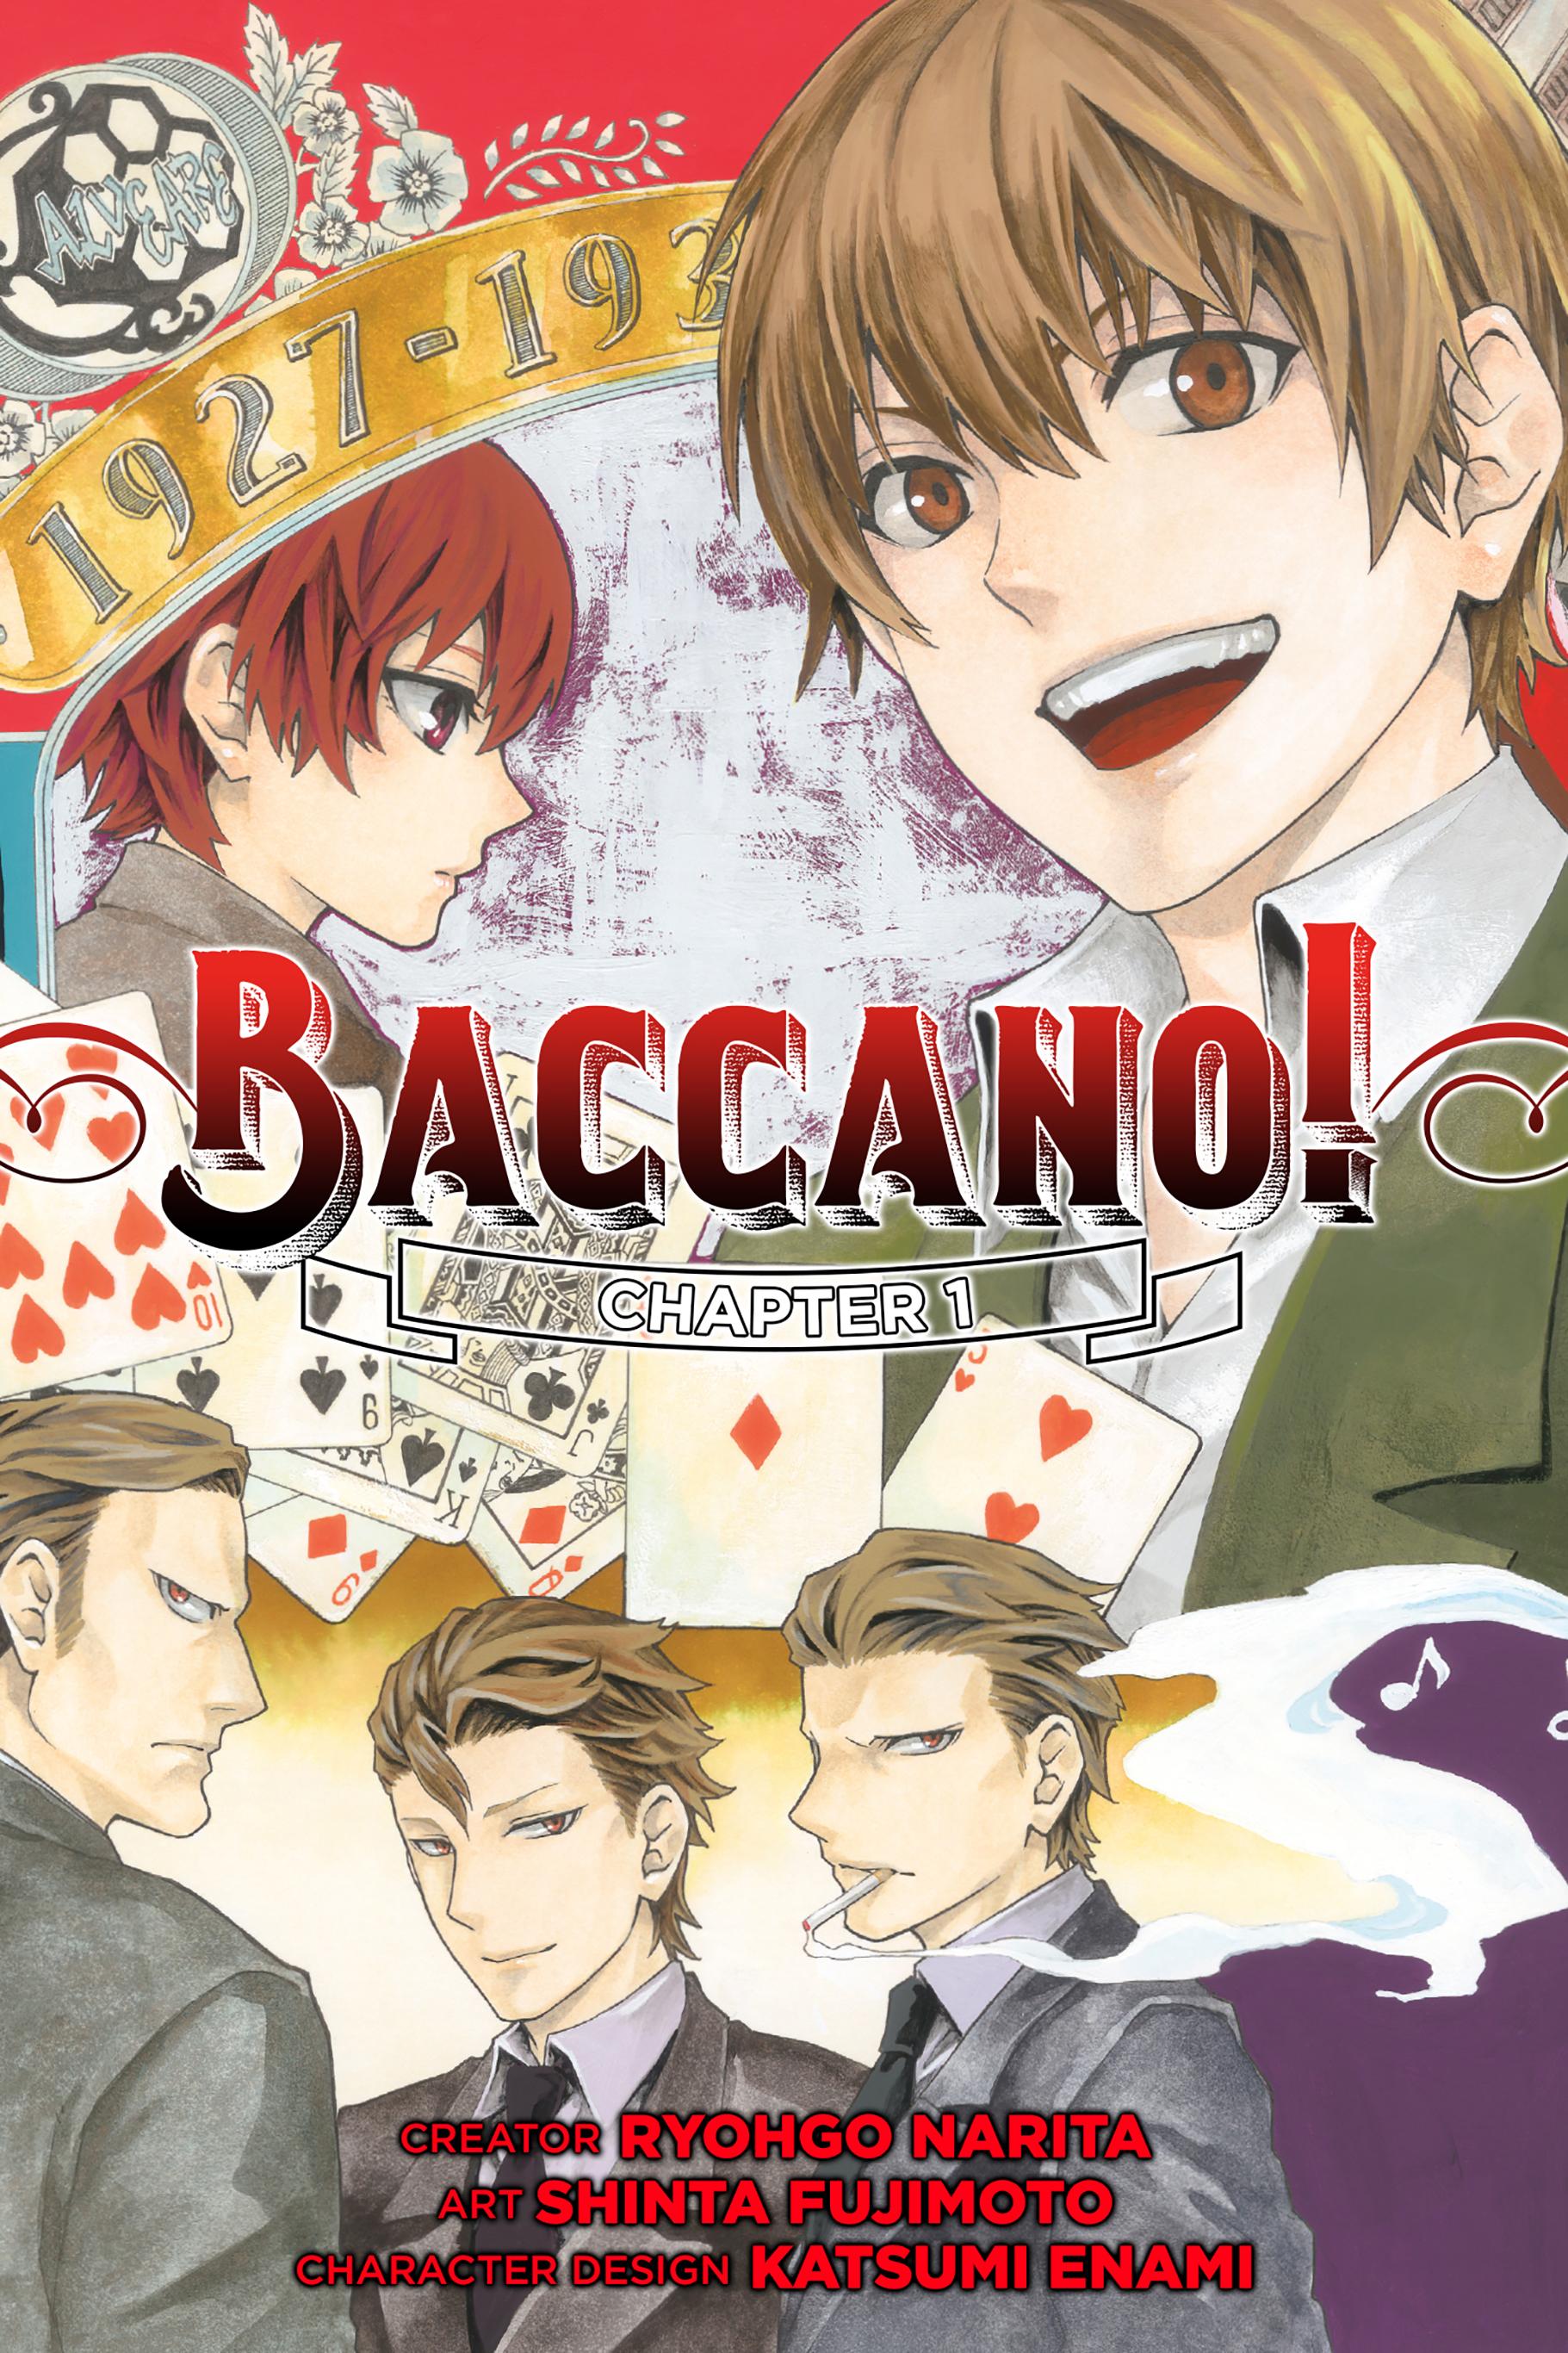 BaccanoChapterCover1.jpg